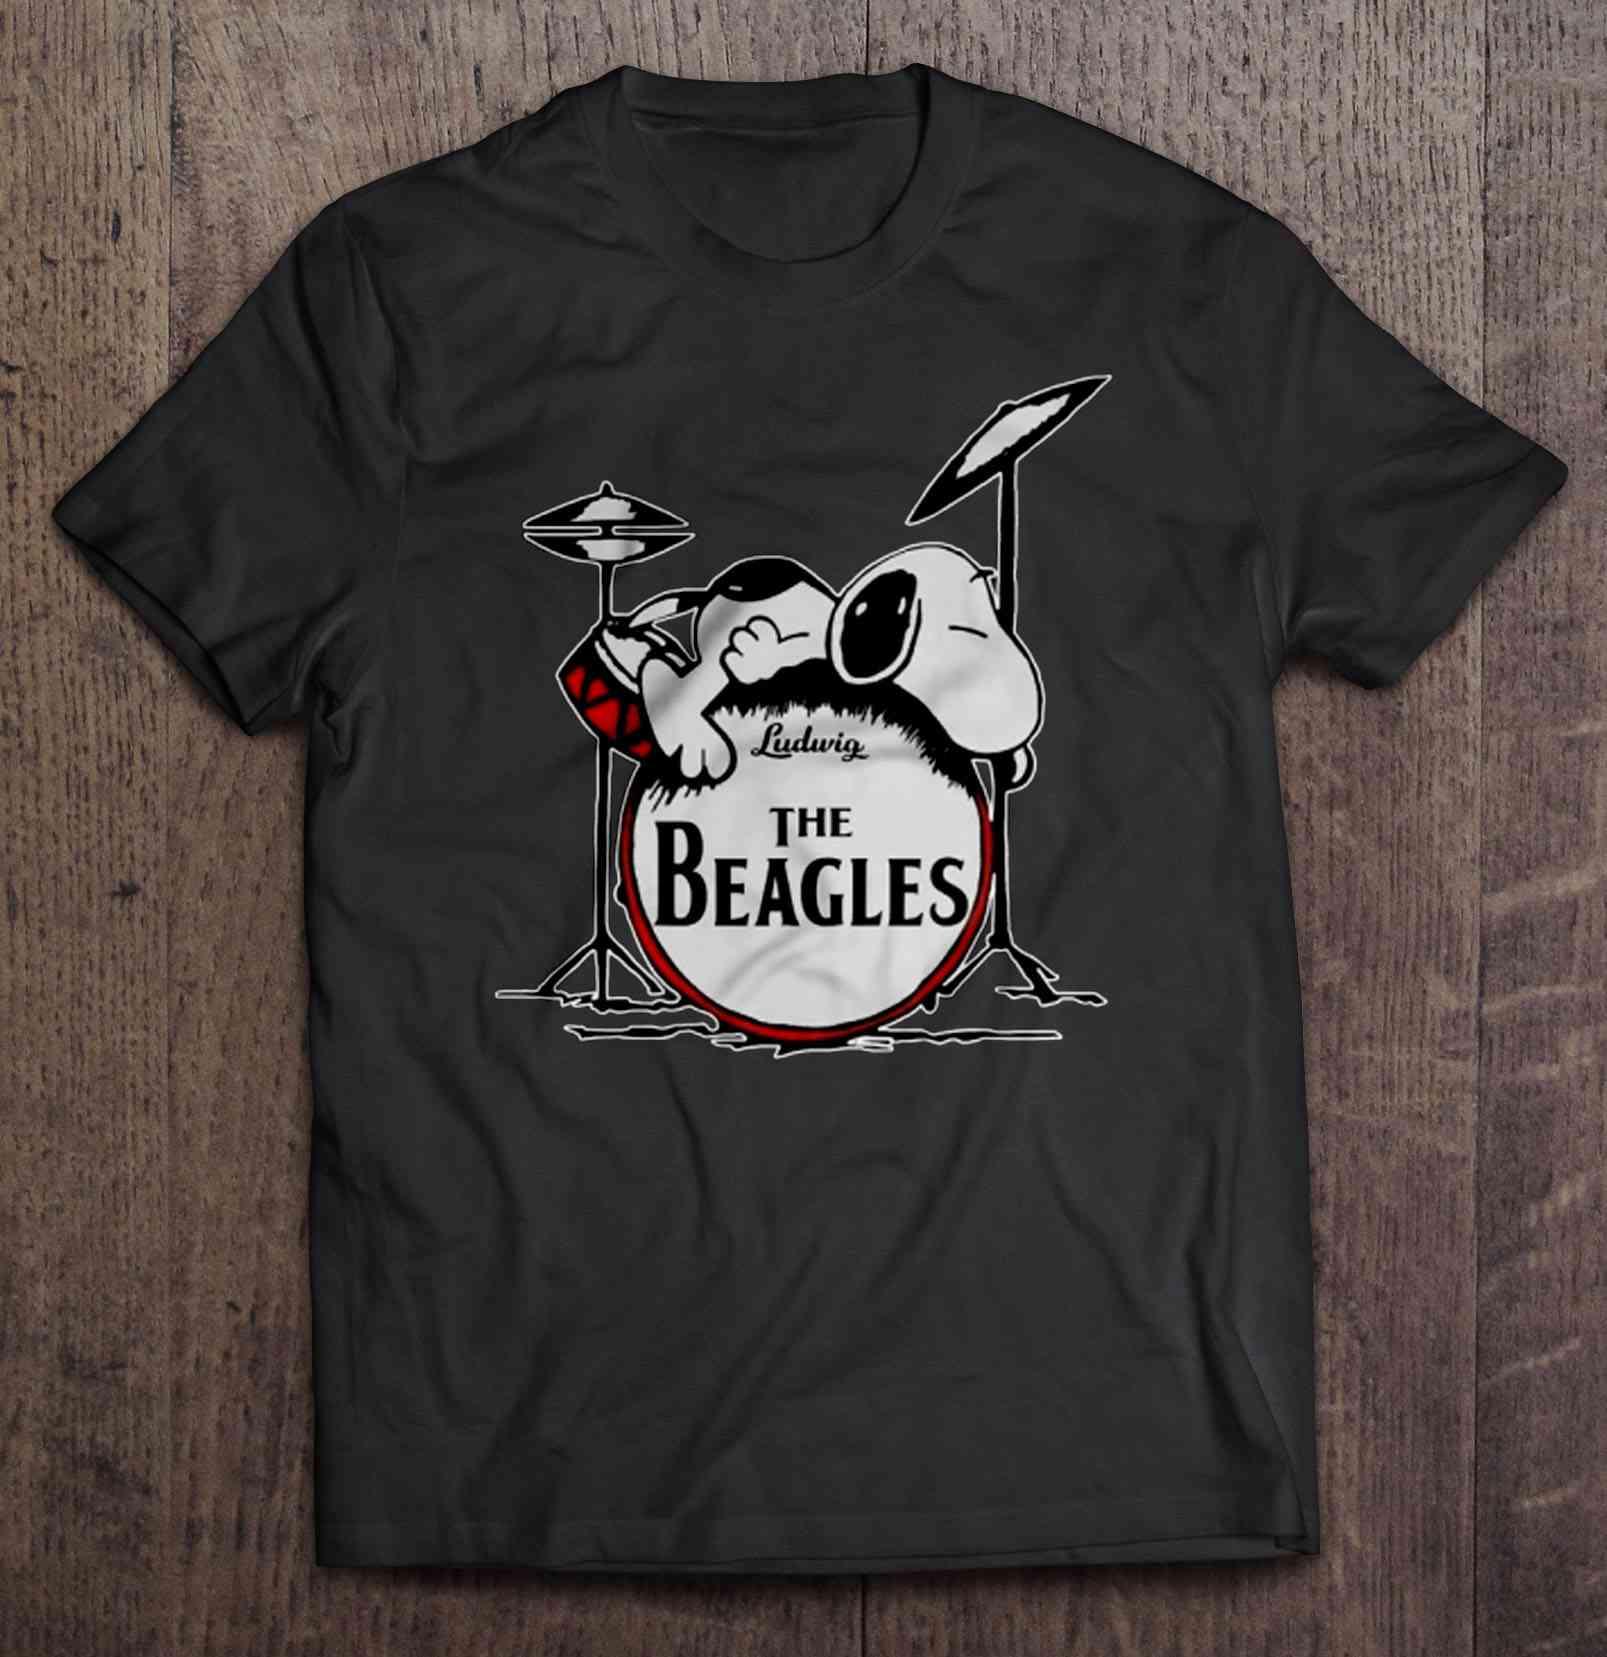 Ludwig The Beagle Snoopy Version Tshirts